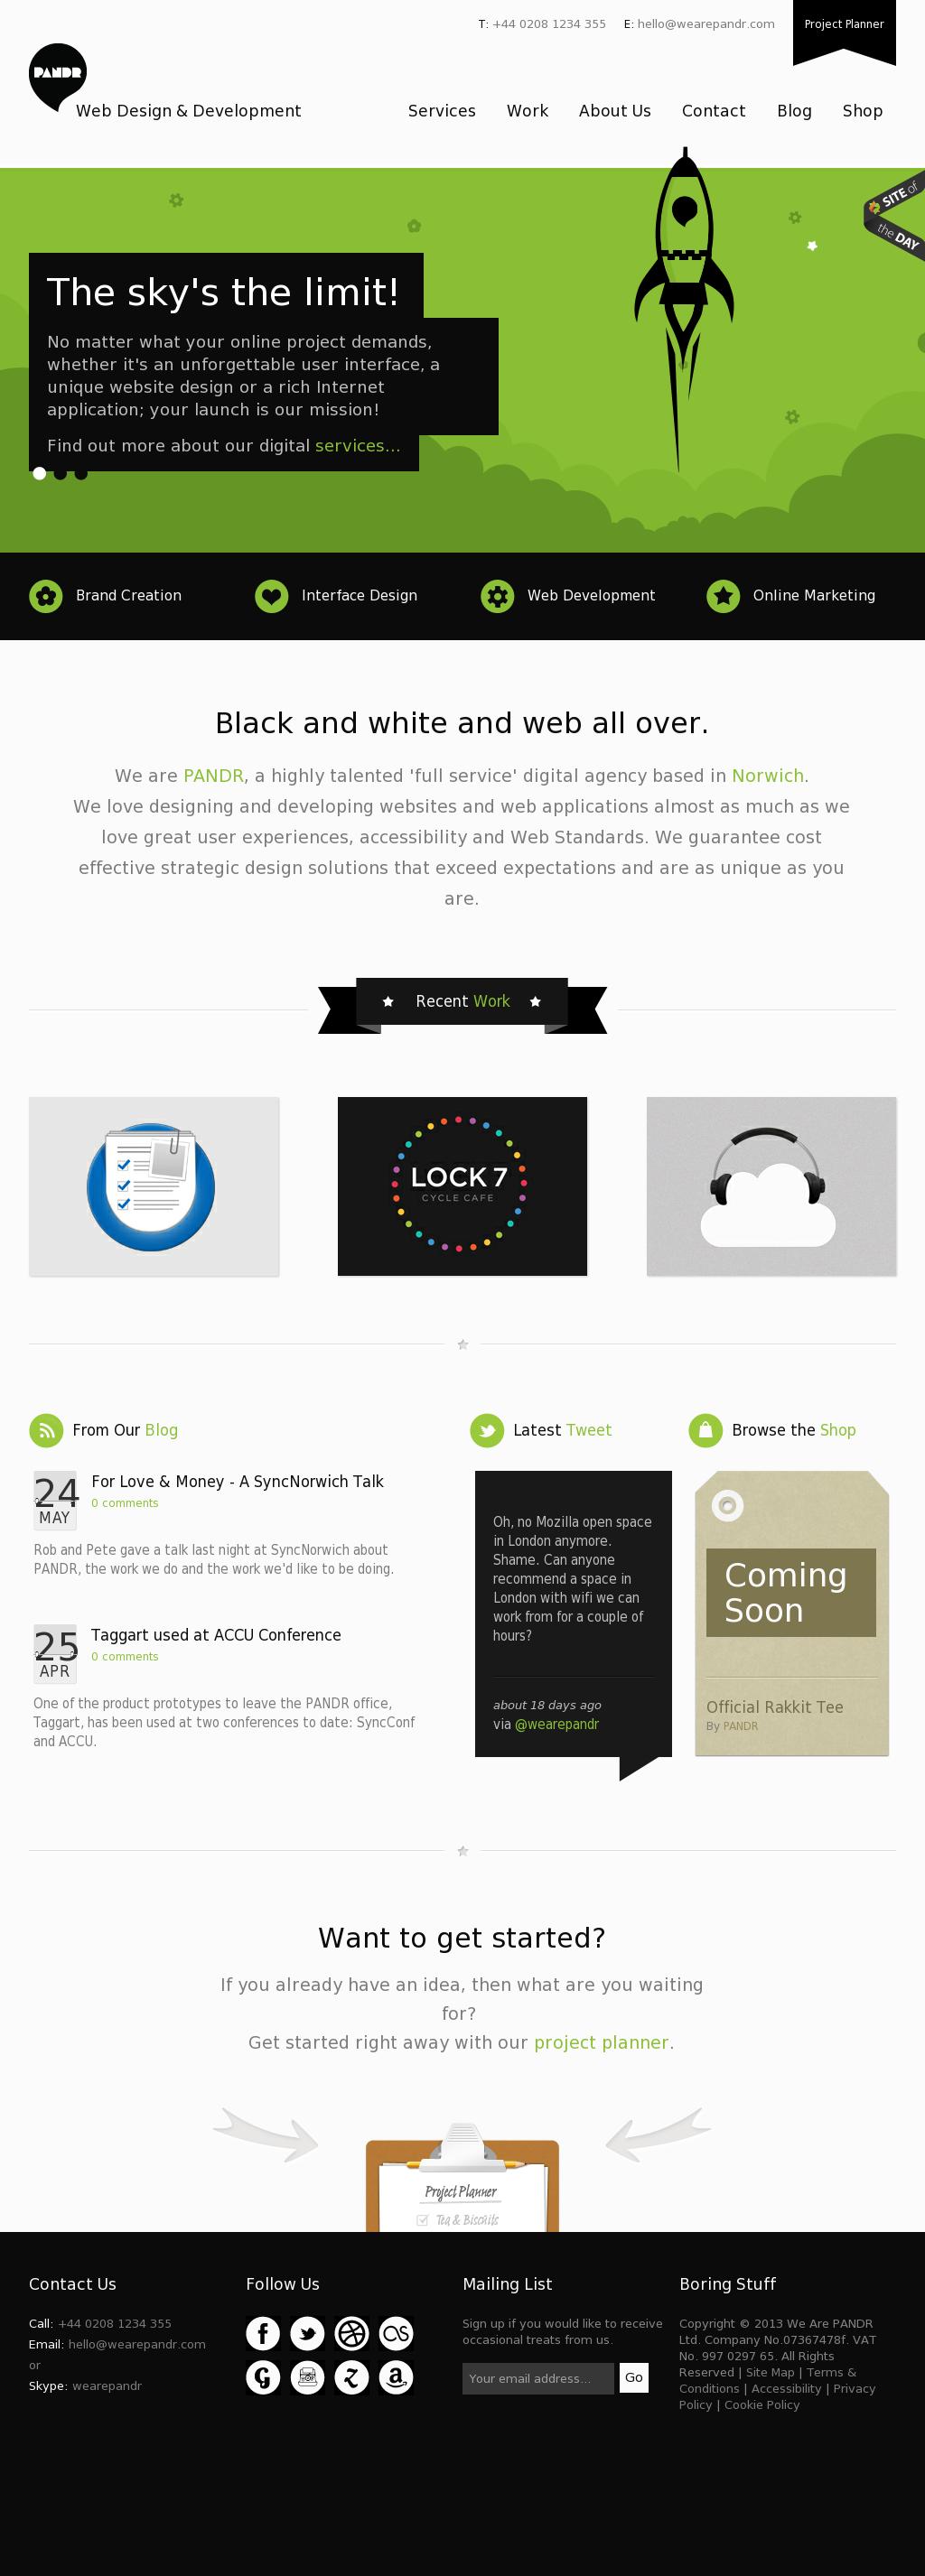 Flat Web Design Web Design Portfolio Web Design Website Inspiration